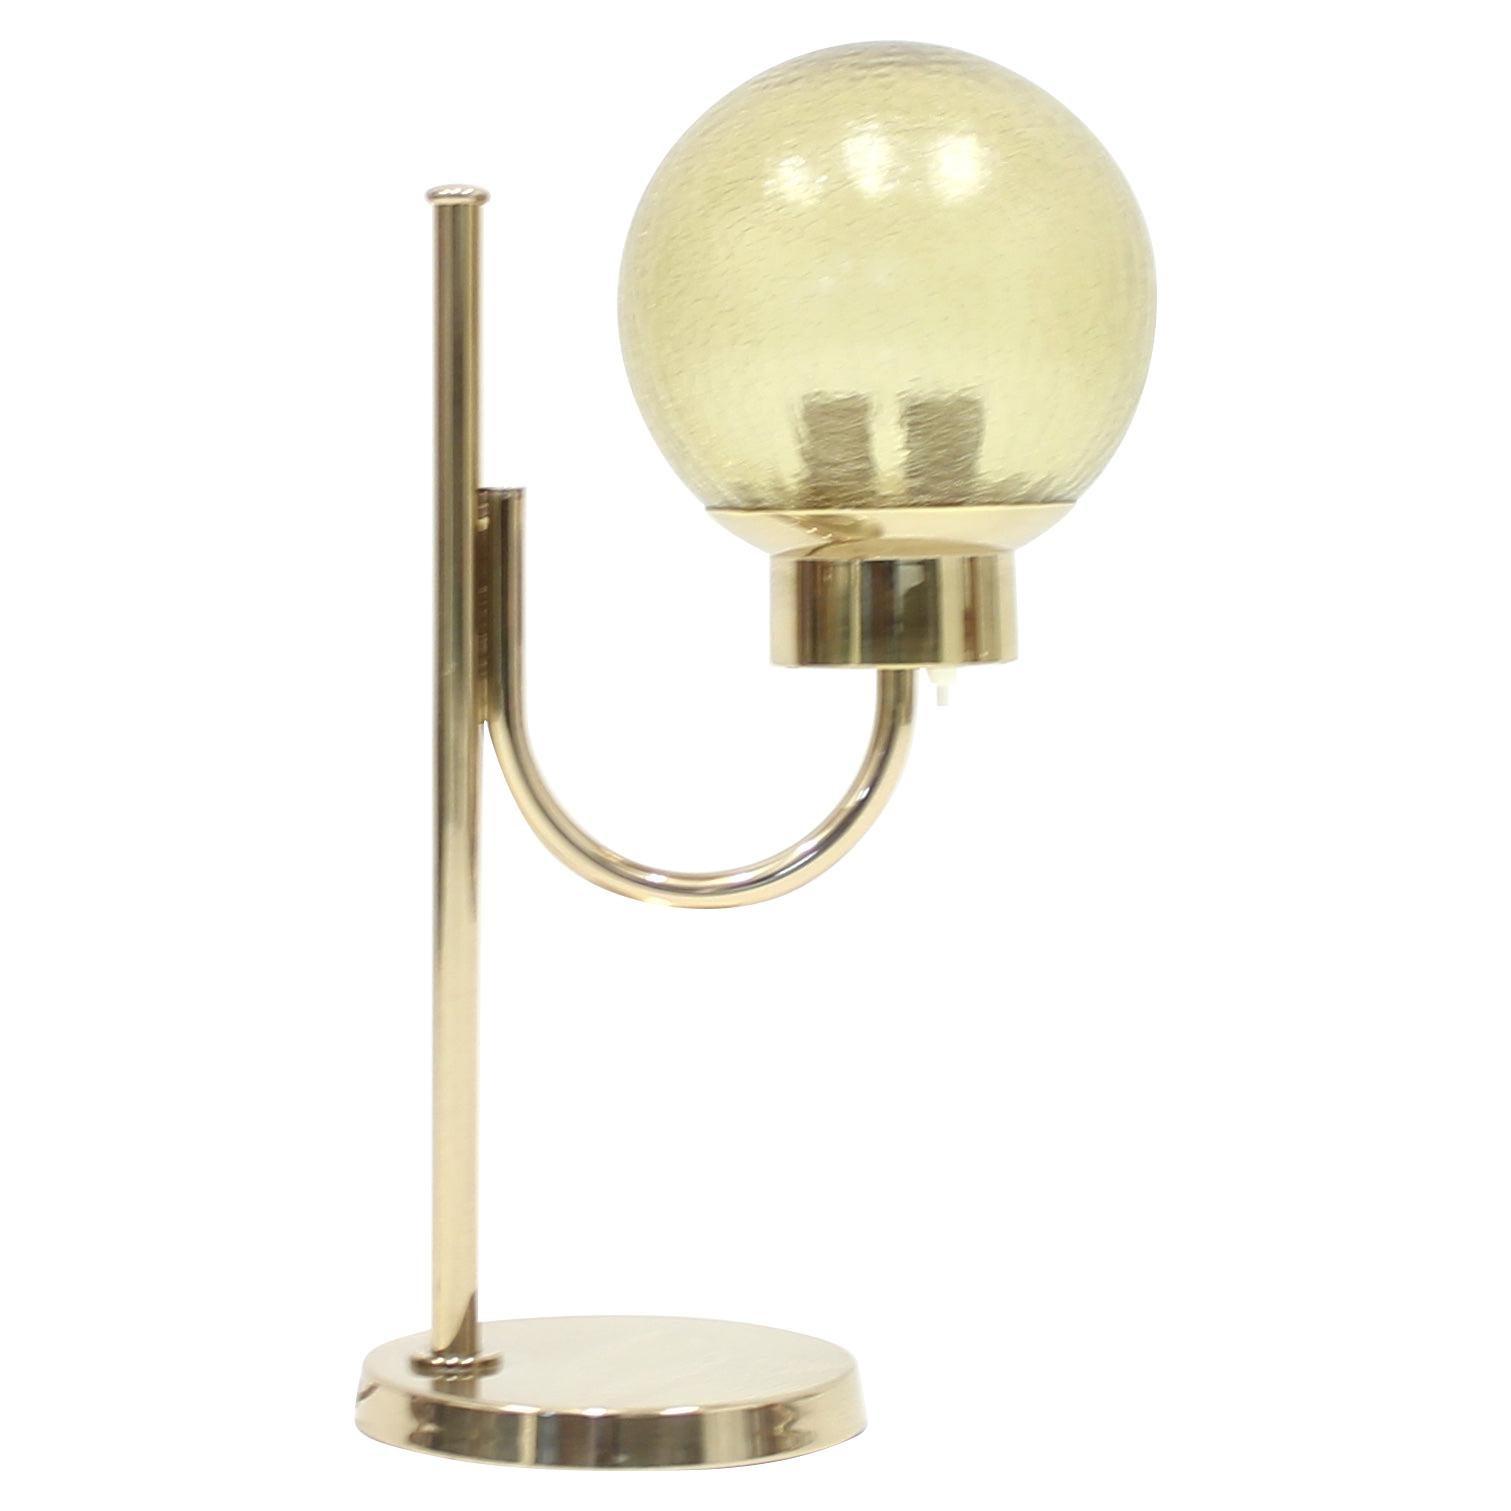 Brass Table Lamp by Bergboms, Model B-090, 1970s